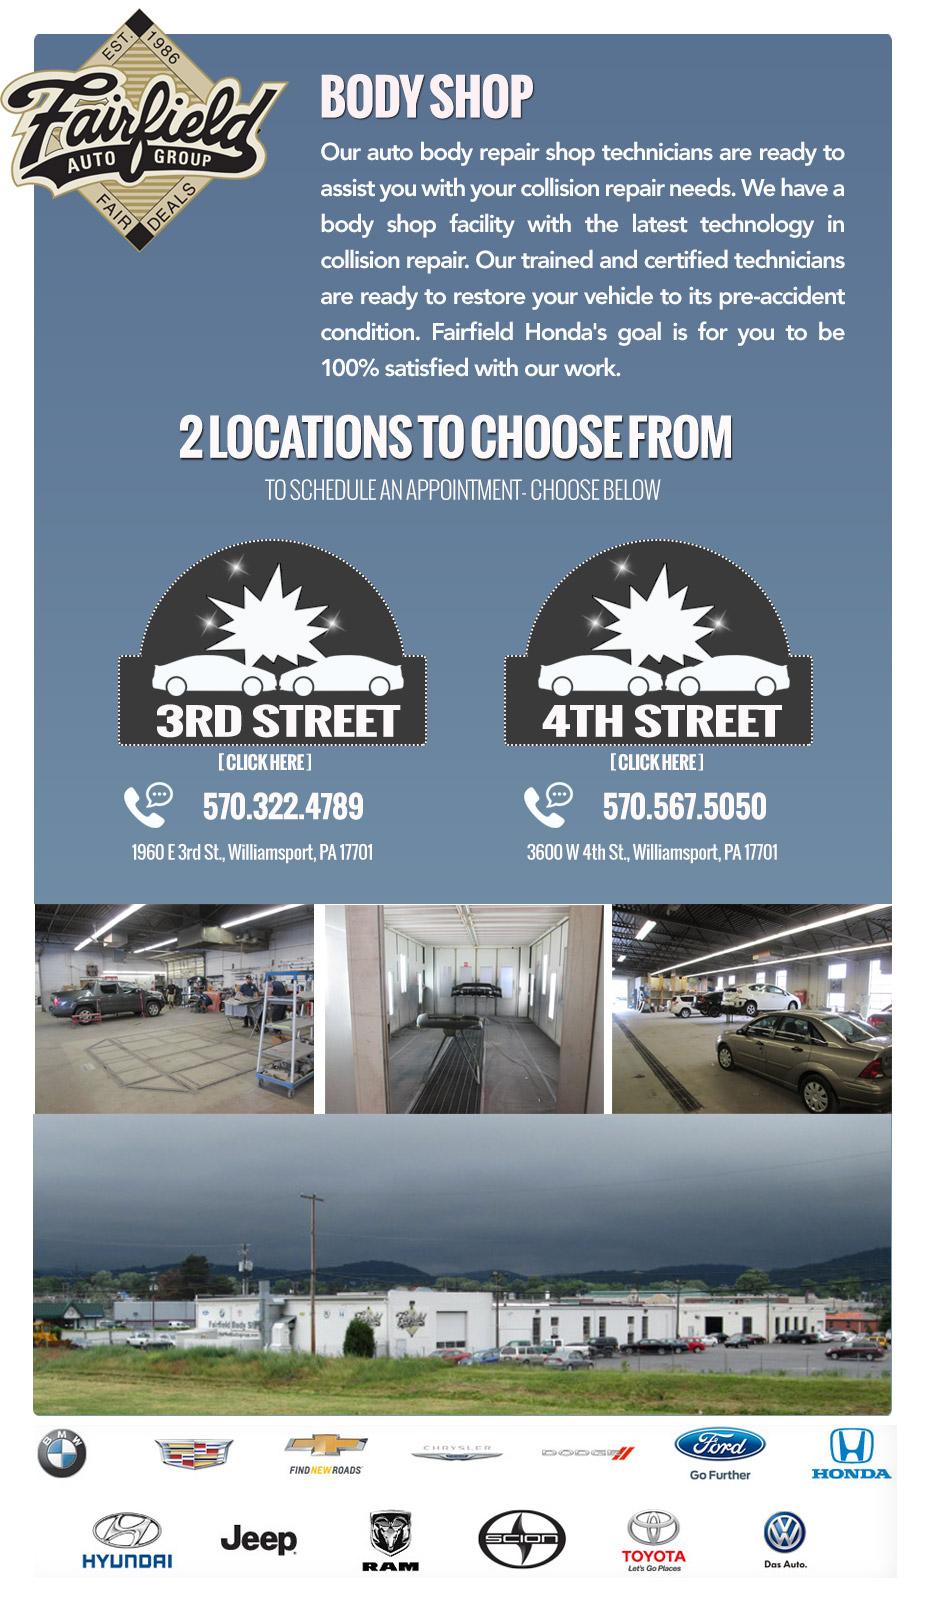 Fairfield Honda Body shop information assistance locations